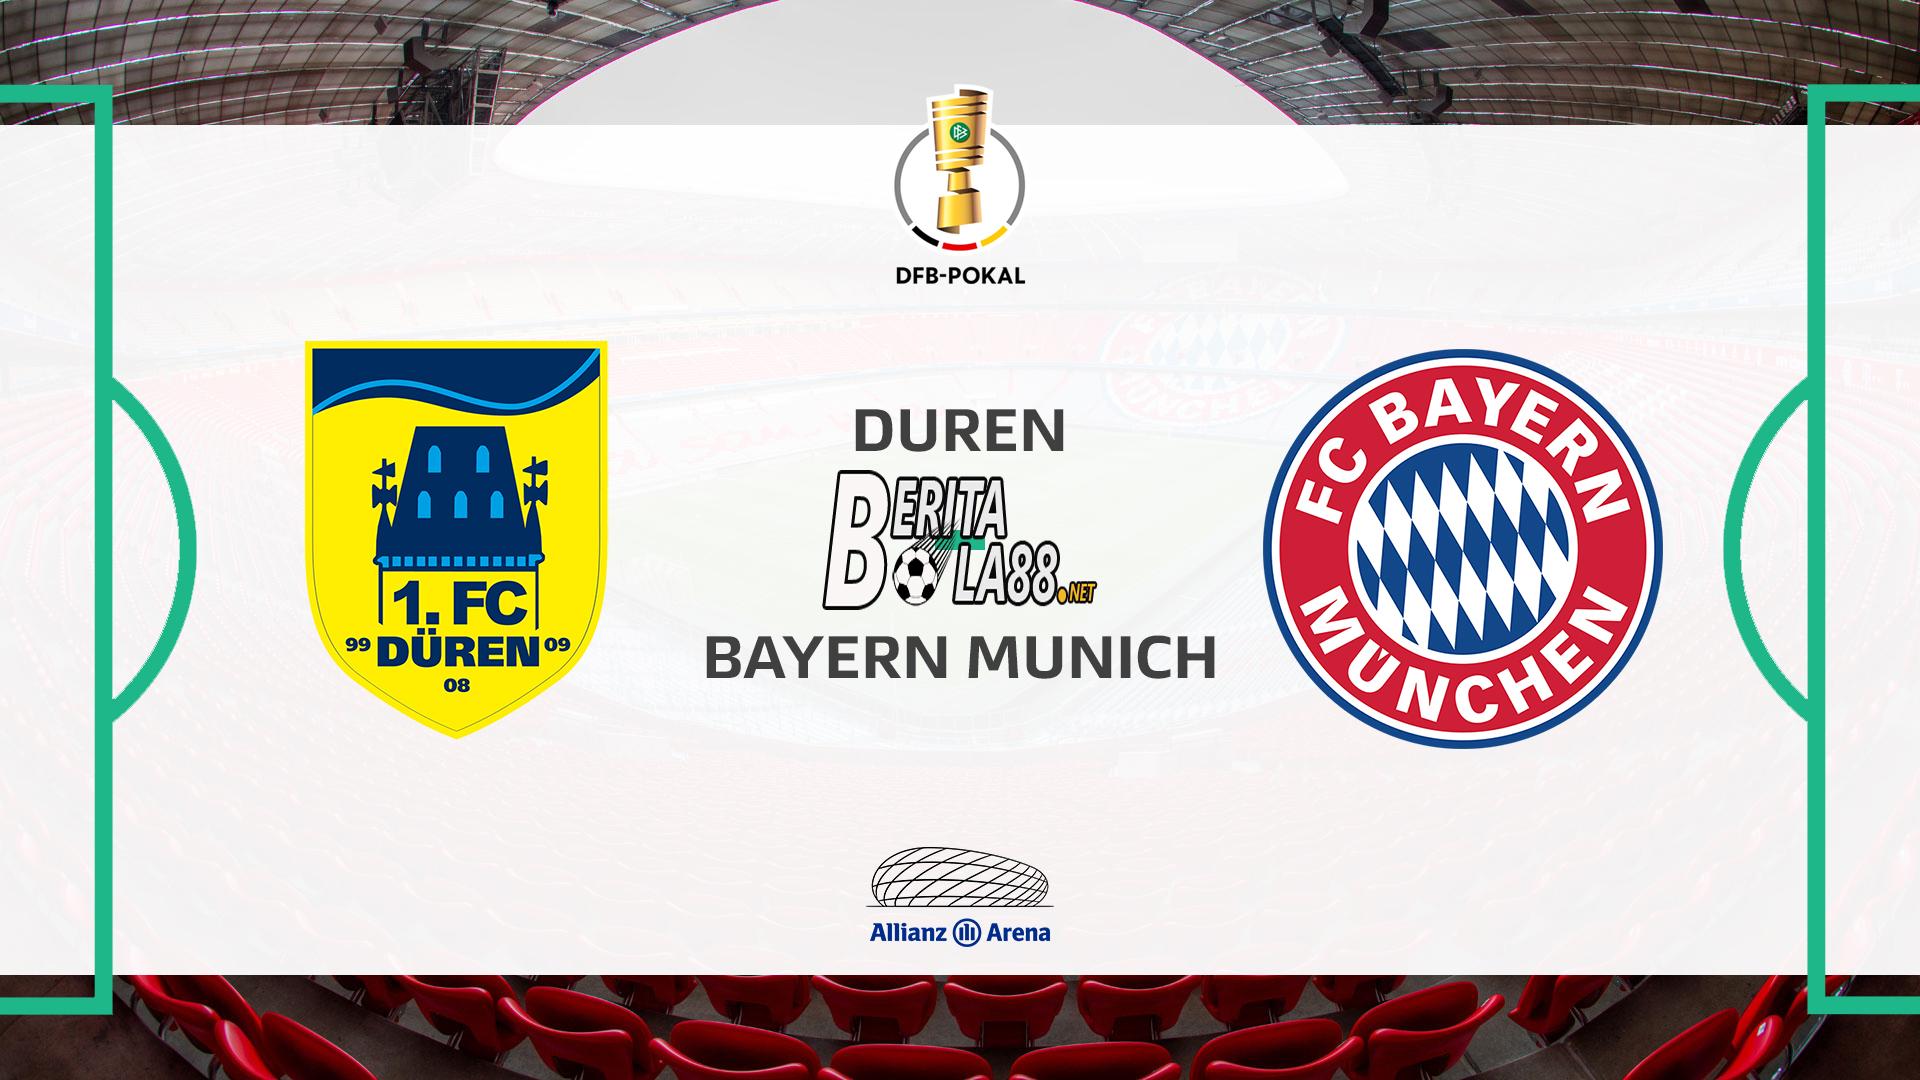 Prediksi Skor Duren vs Bayern Munich 16 oktober 2020